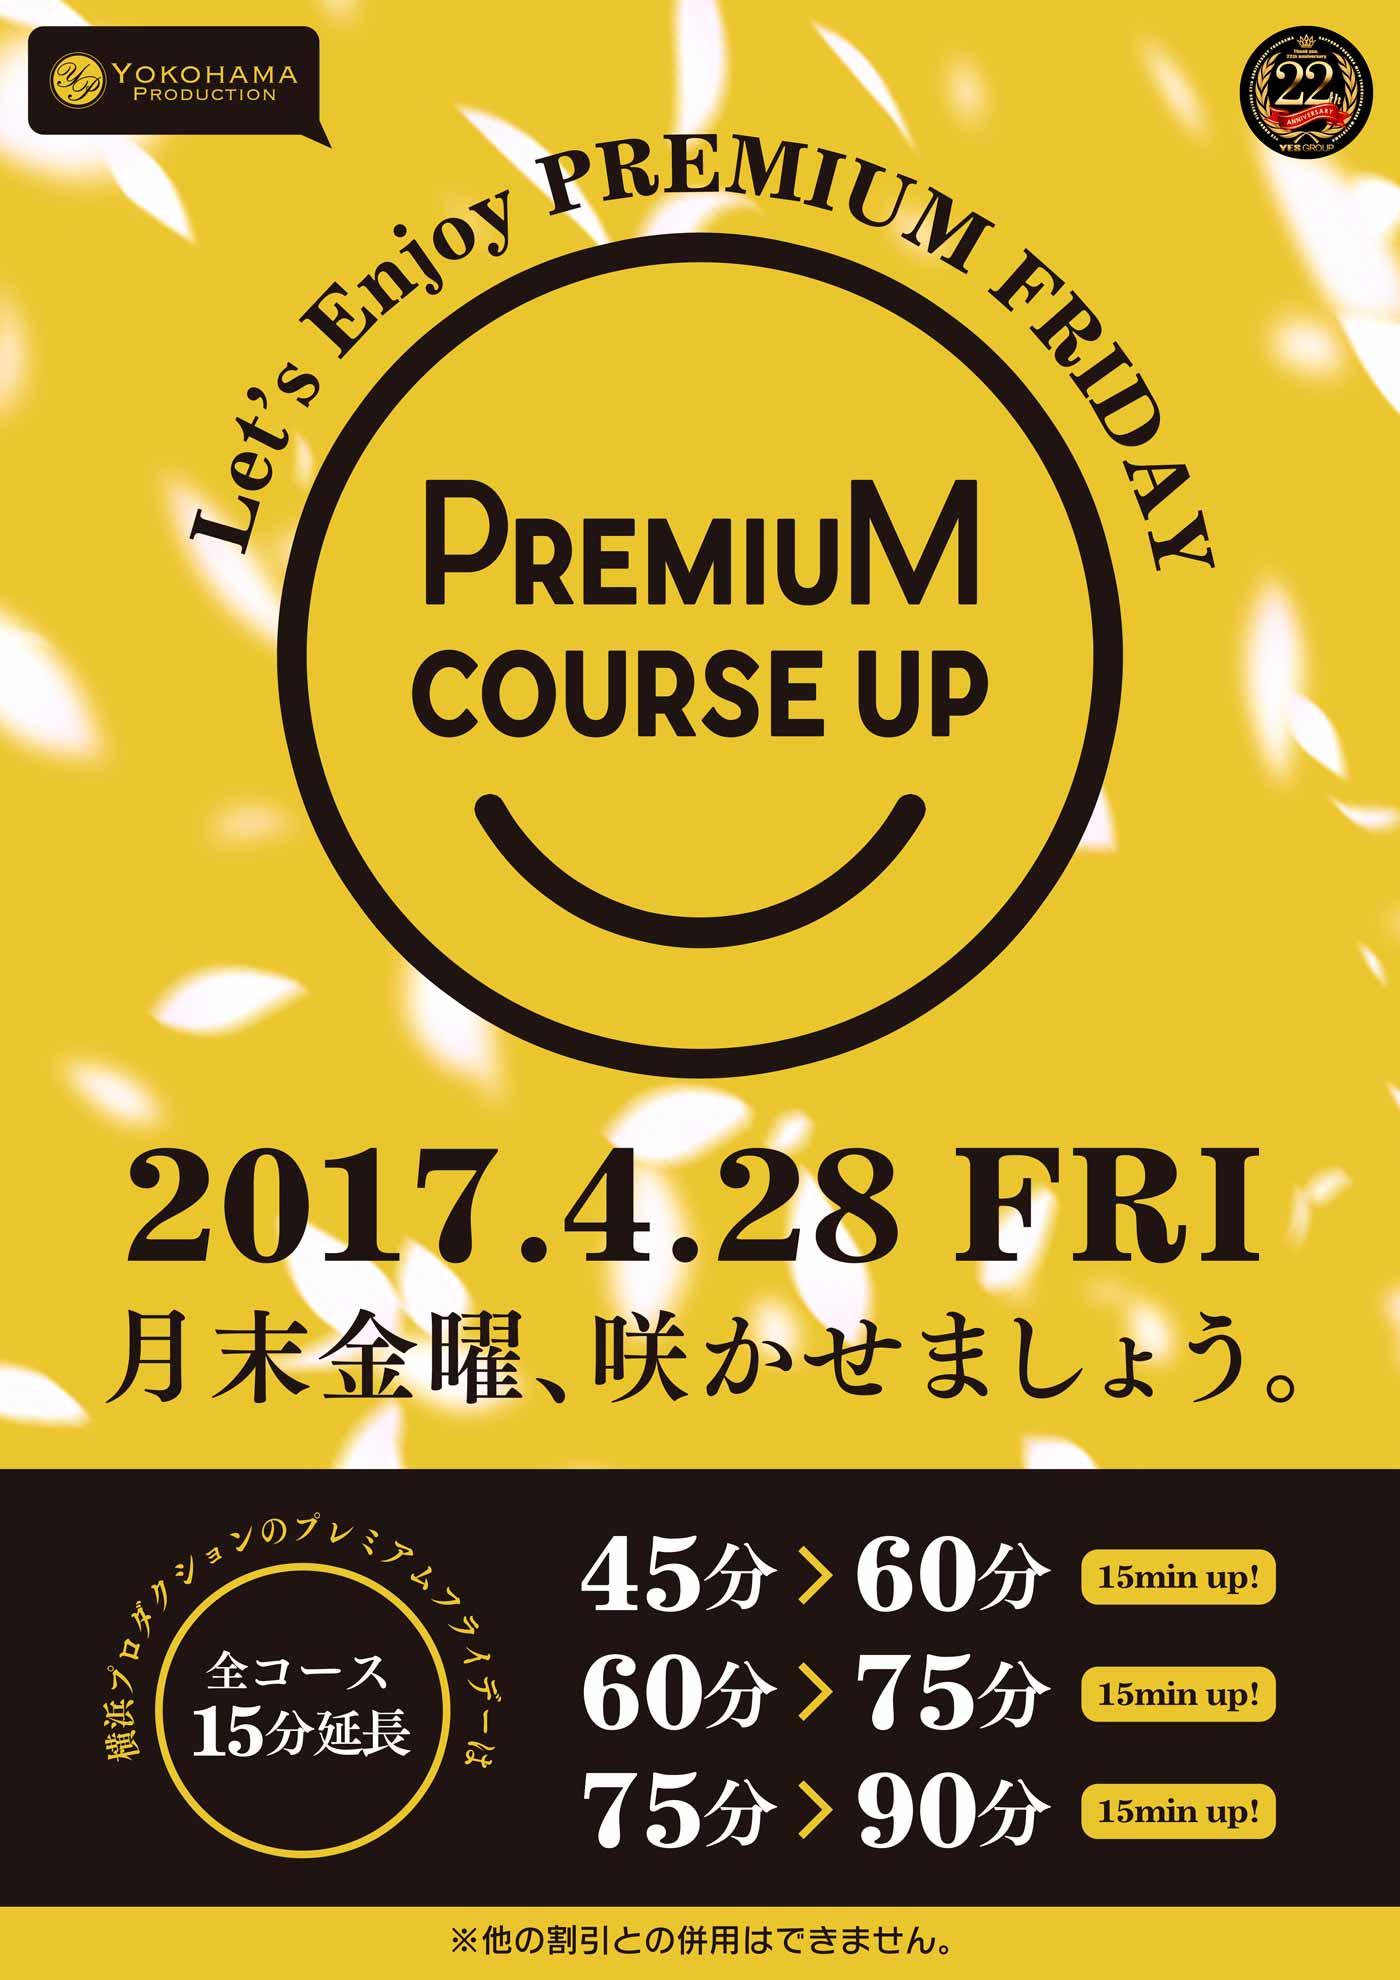 ◆PREMIUM COUSE UP~全コース15分延長!~